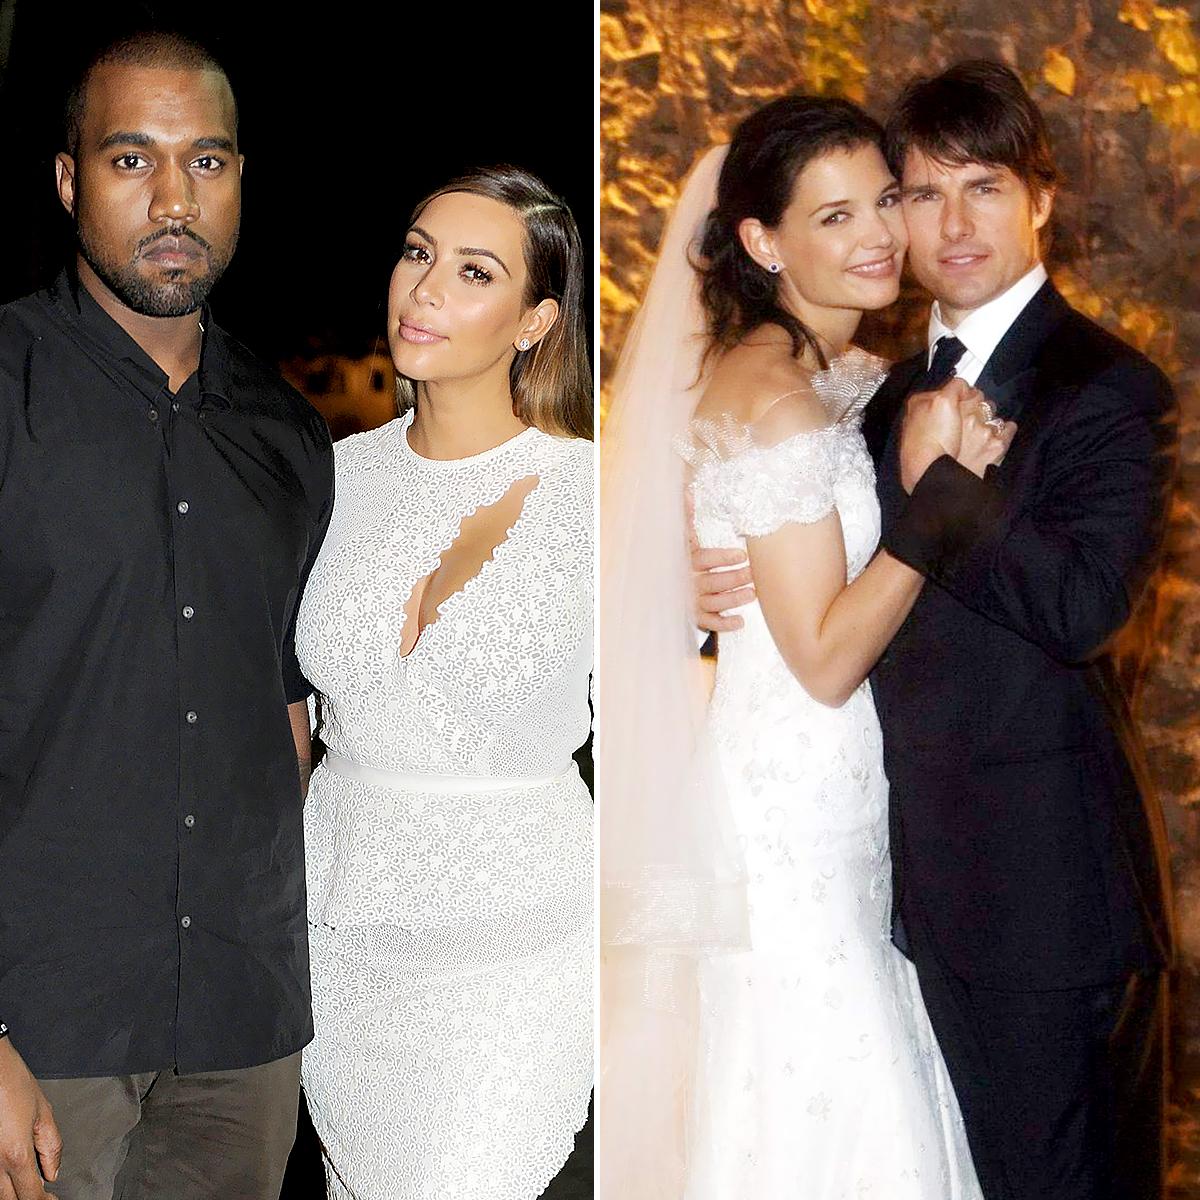 Kim-Kardashian-and-Kanye-West-and-Tom-Cruise-and-Katie-Holmes-weddings